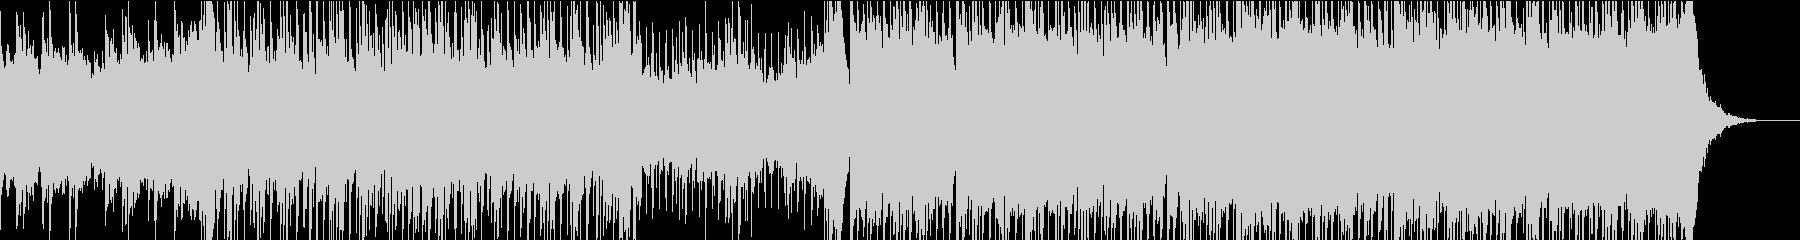 80's シンセウェーブ レトロ 洋楽の未再生の波形